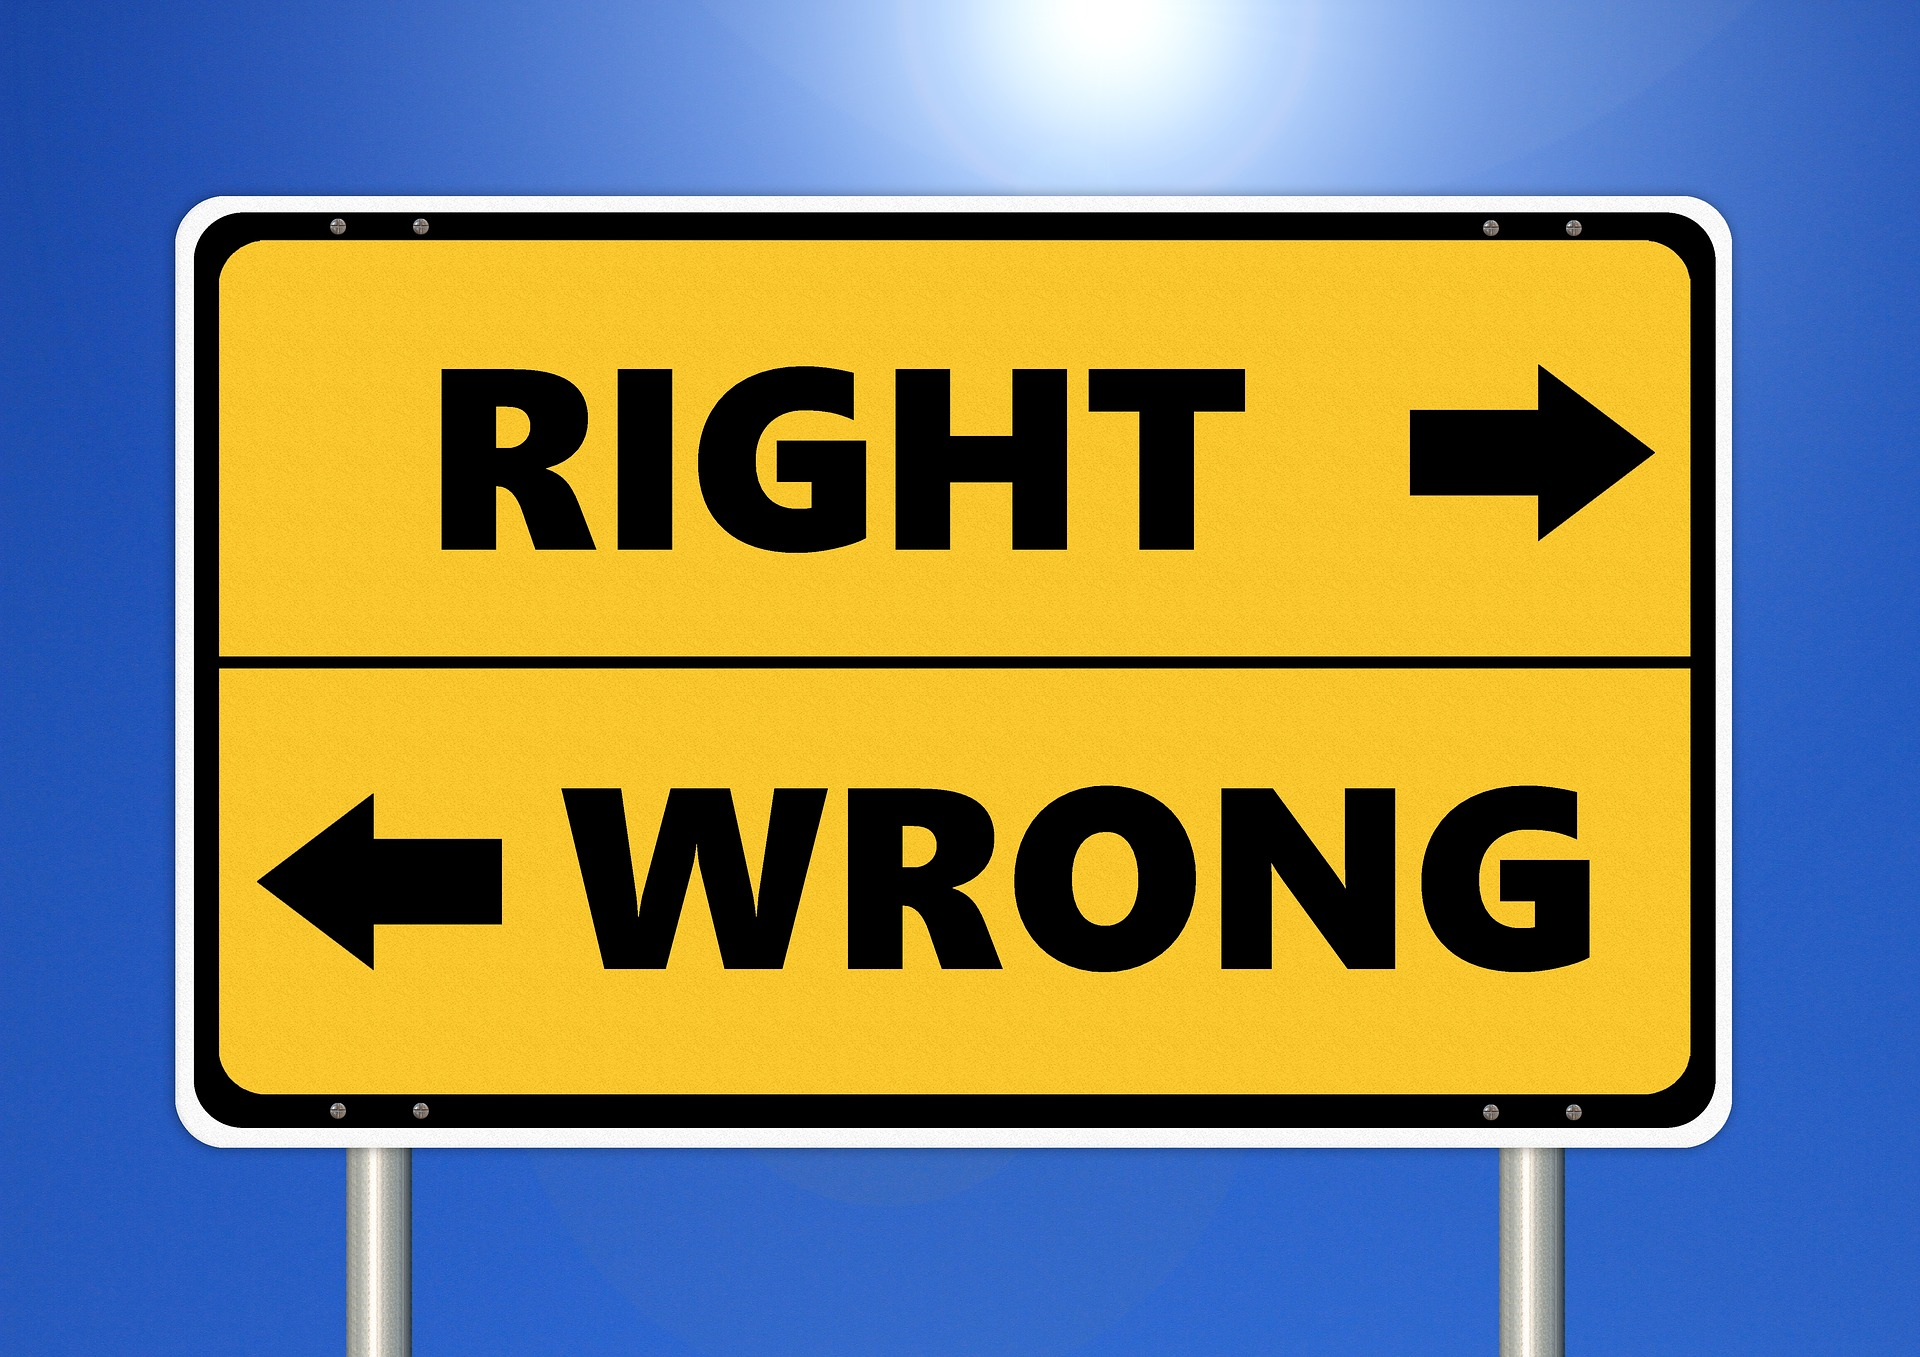 values, right, wrong, behaviors